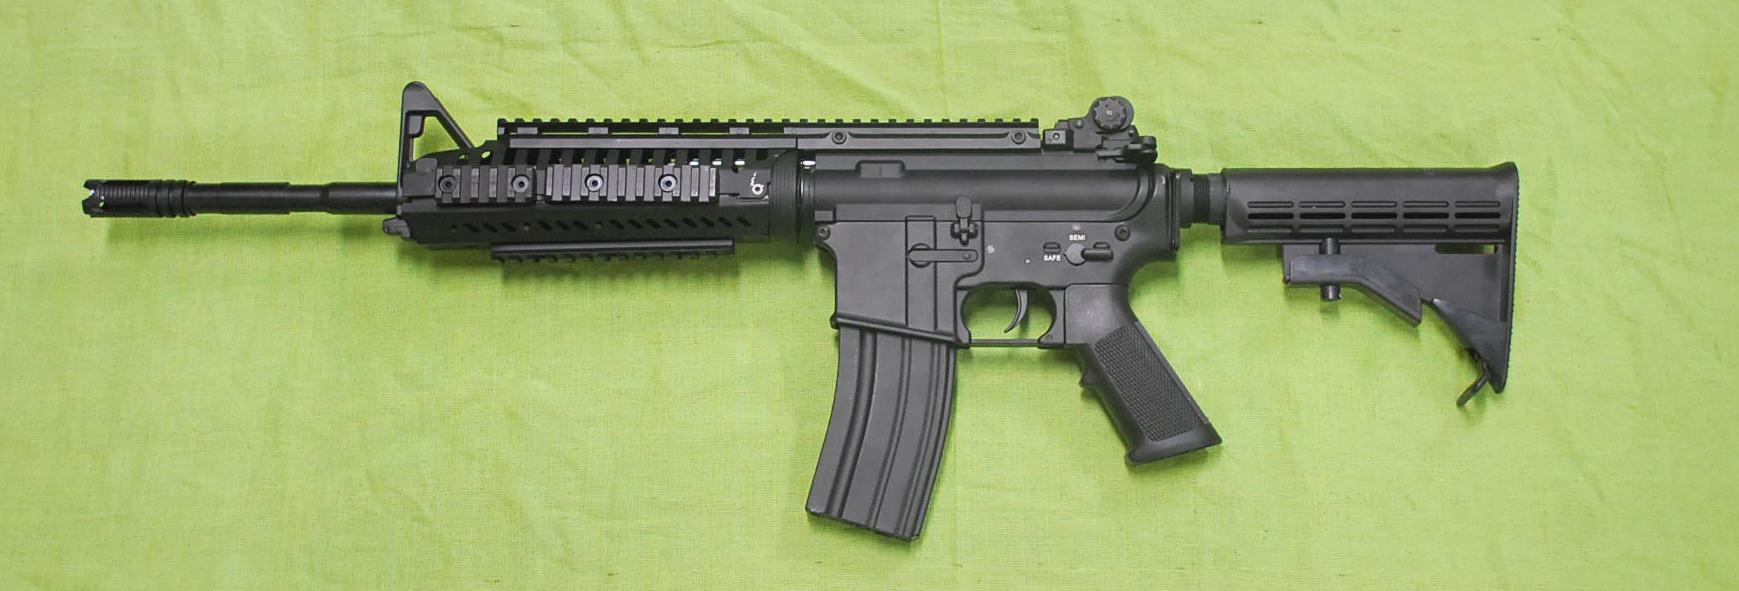 Dboy製 M4ボルターCASV